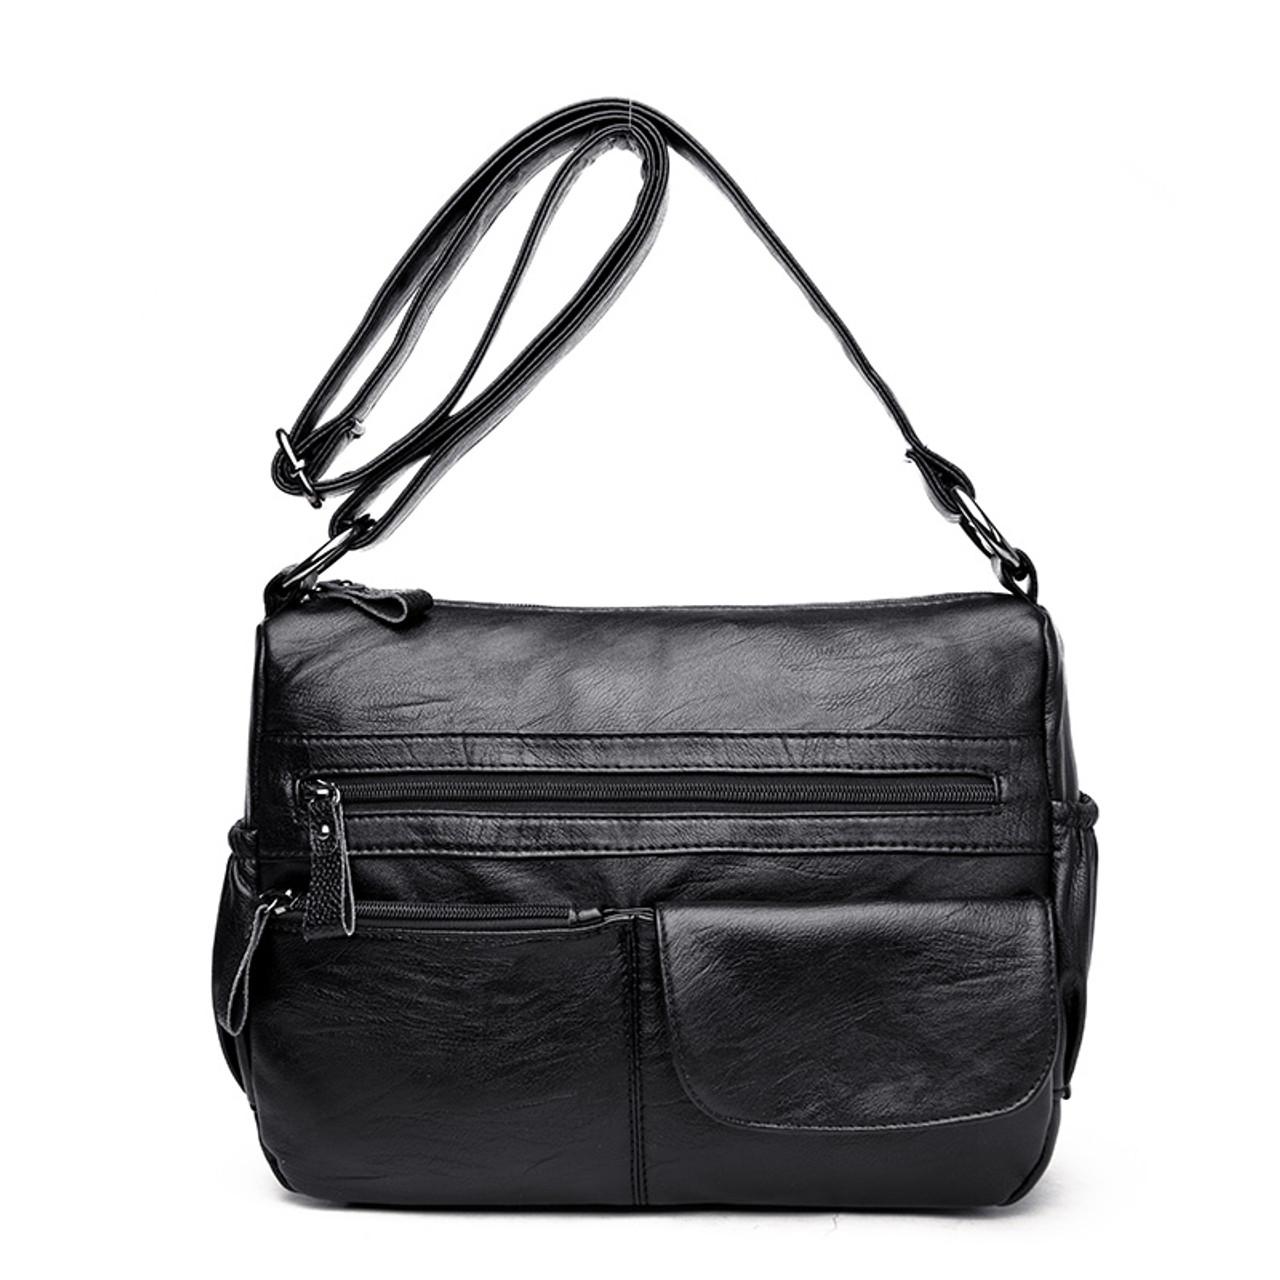 dbcd962924a0 ... Kavard Brand Women Messenger Bags Shoulder Designer High Quality  Leather Bags Women Double Zippers Crossbody Bags ...